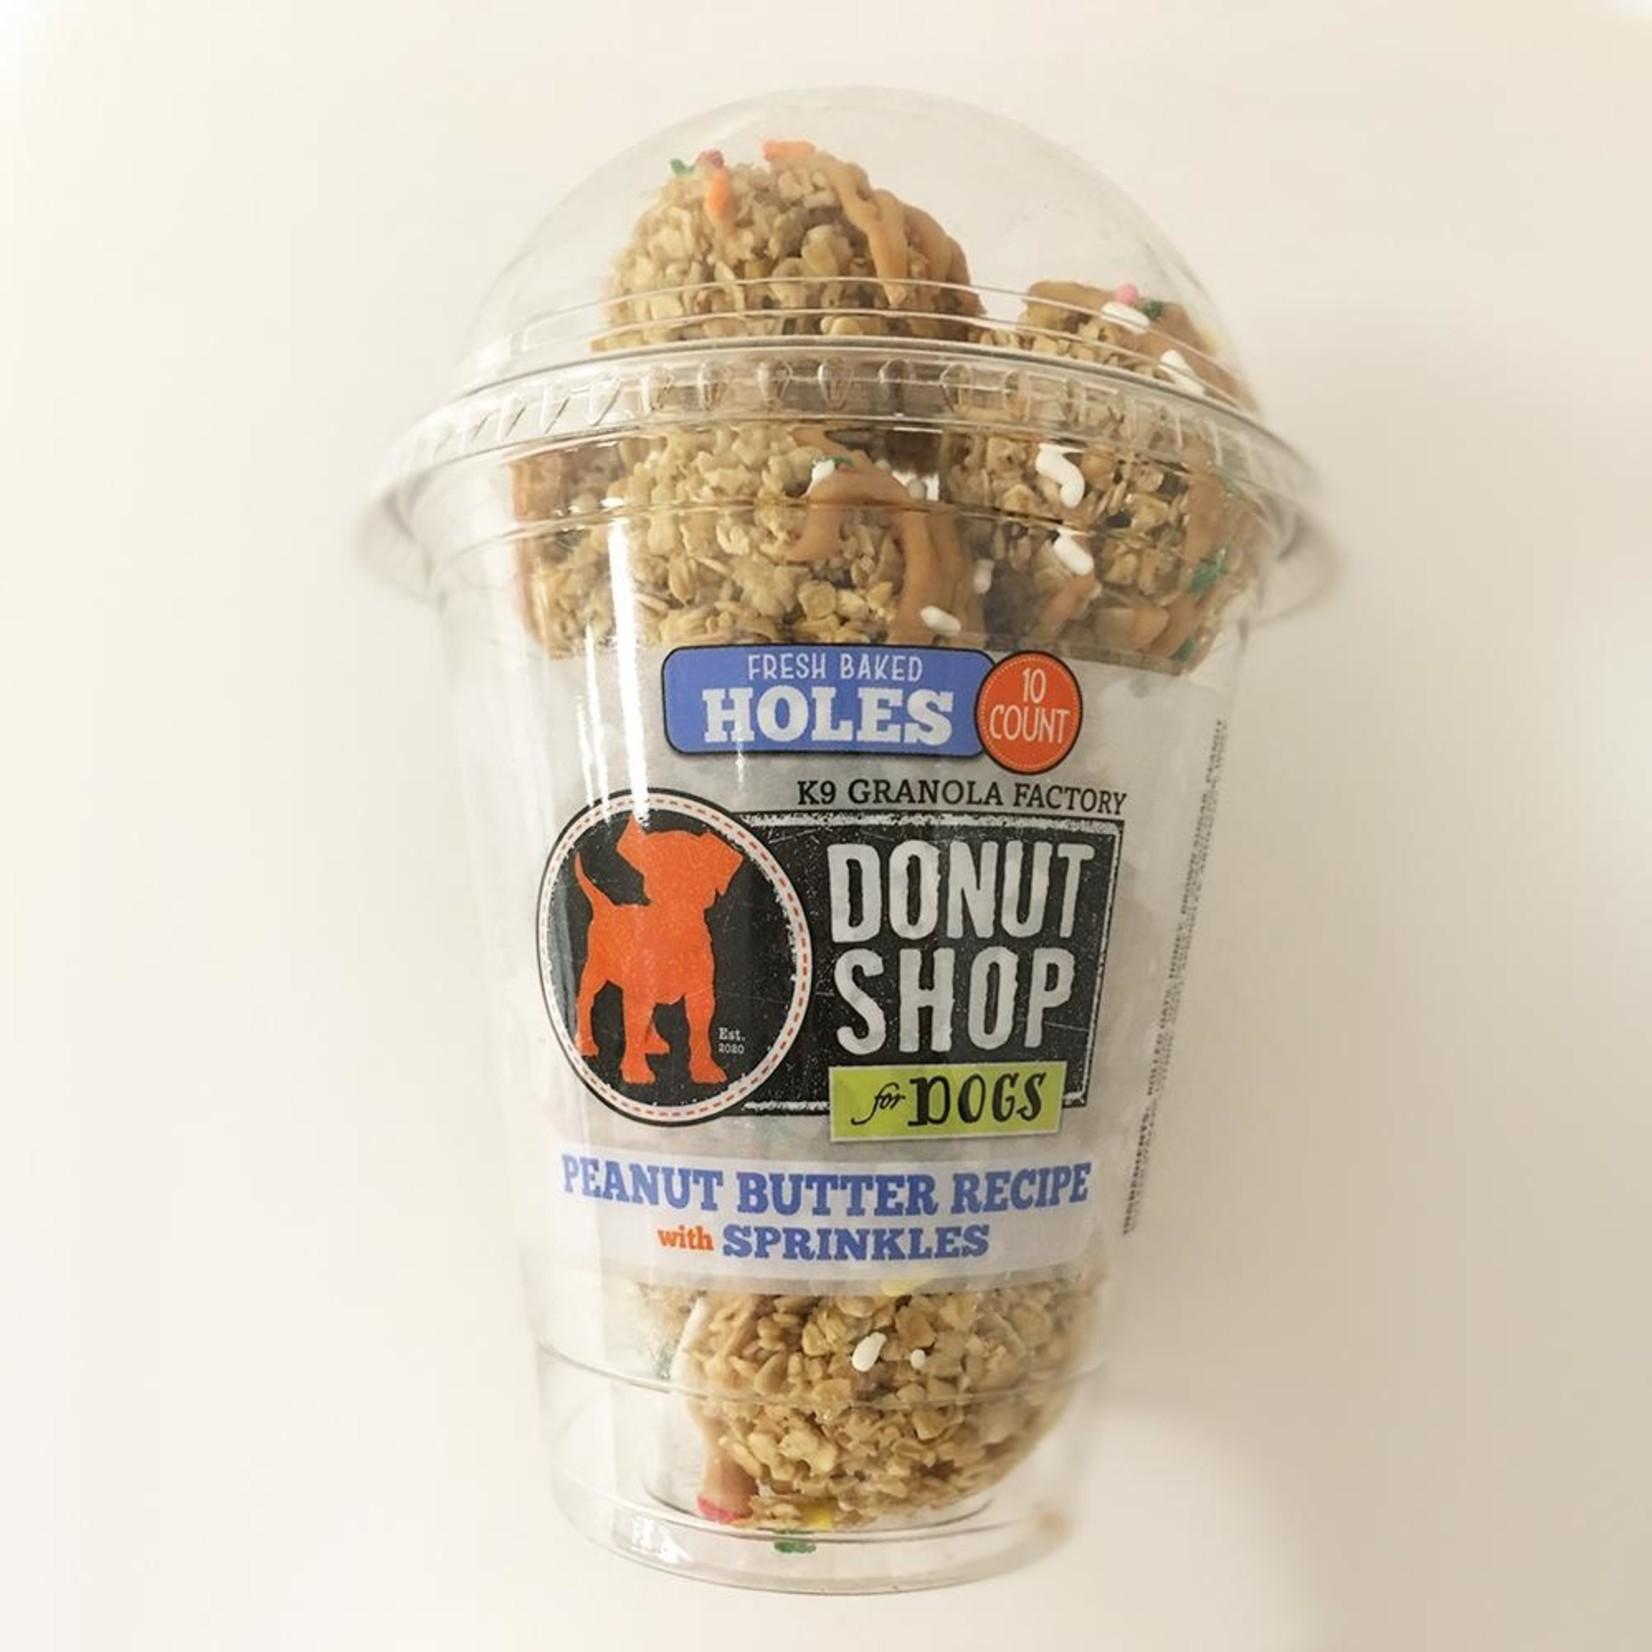 K9 Granola Factory K9 Granola Factory Donut Holes PB & Sprinkles Dog Treats 15ct